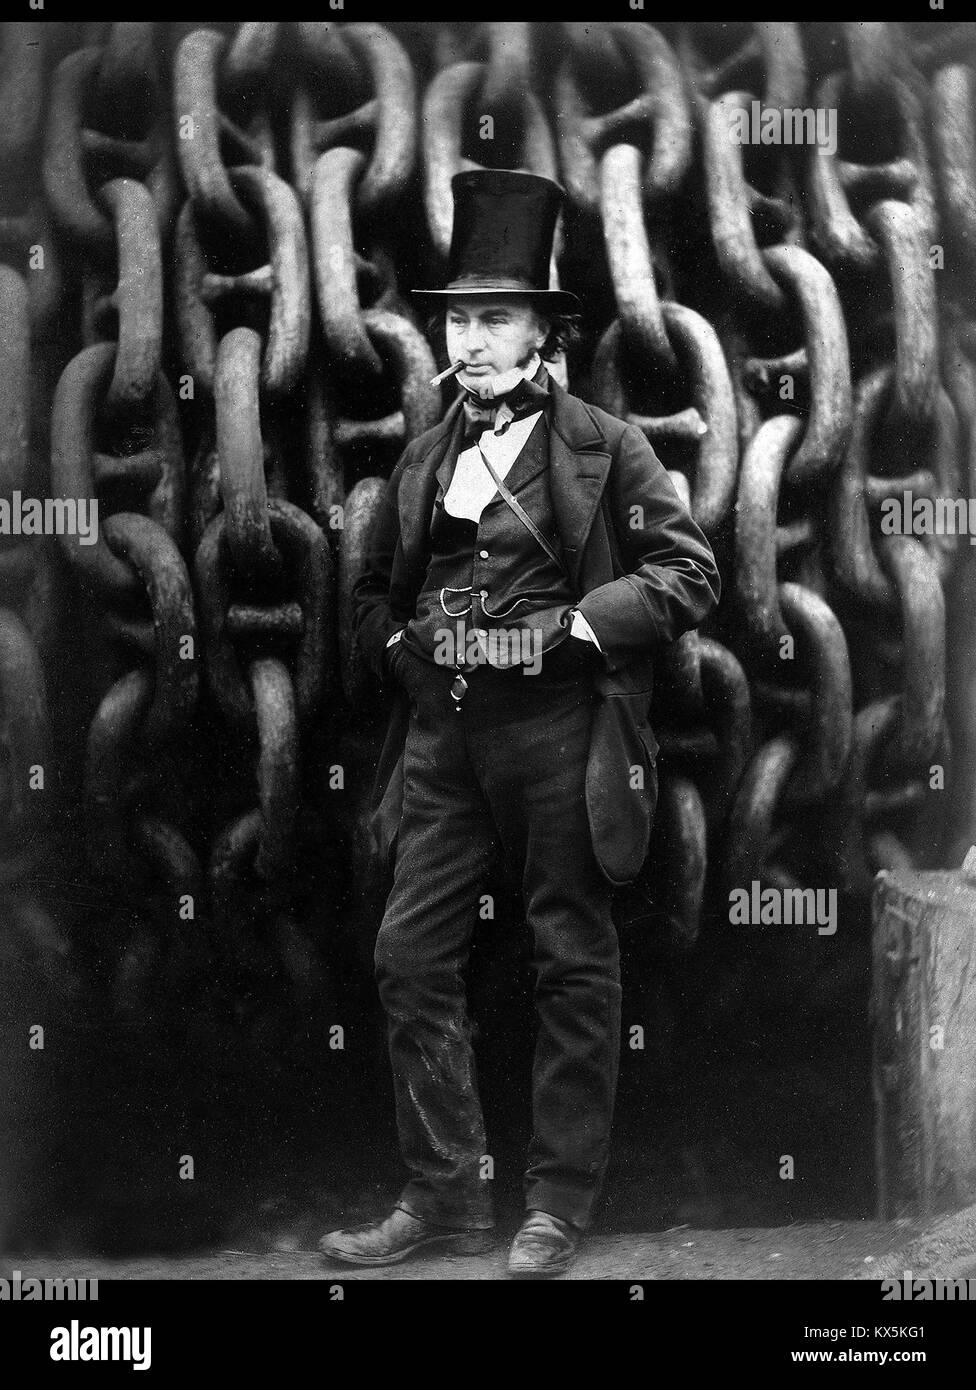 Isambard Kingdom Brunel, English mechanical and civil engineer - Stock Image